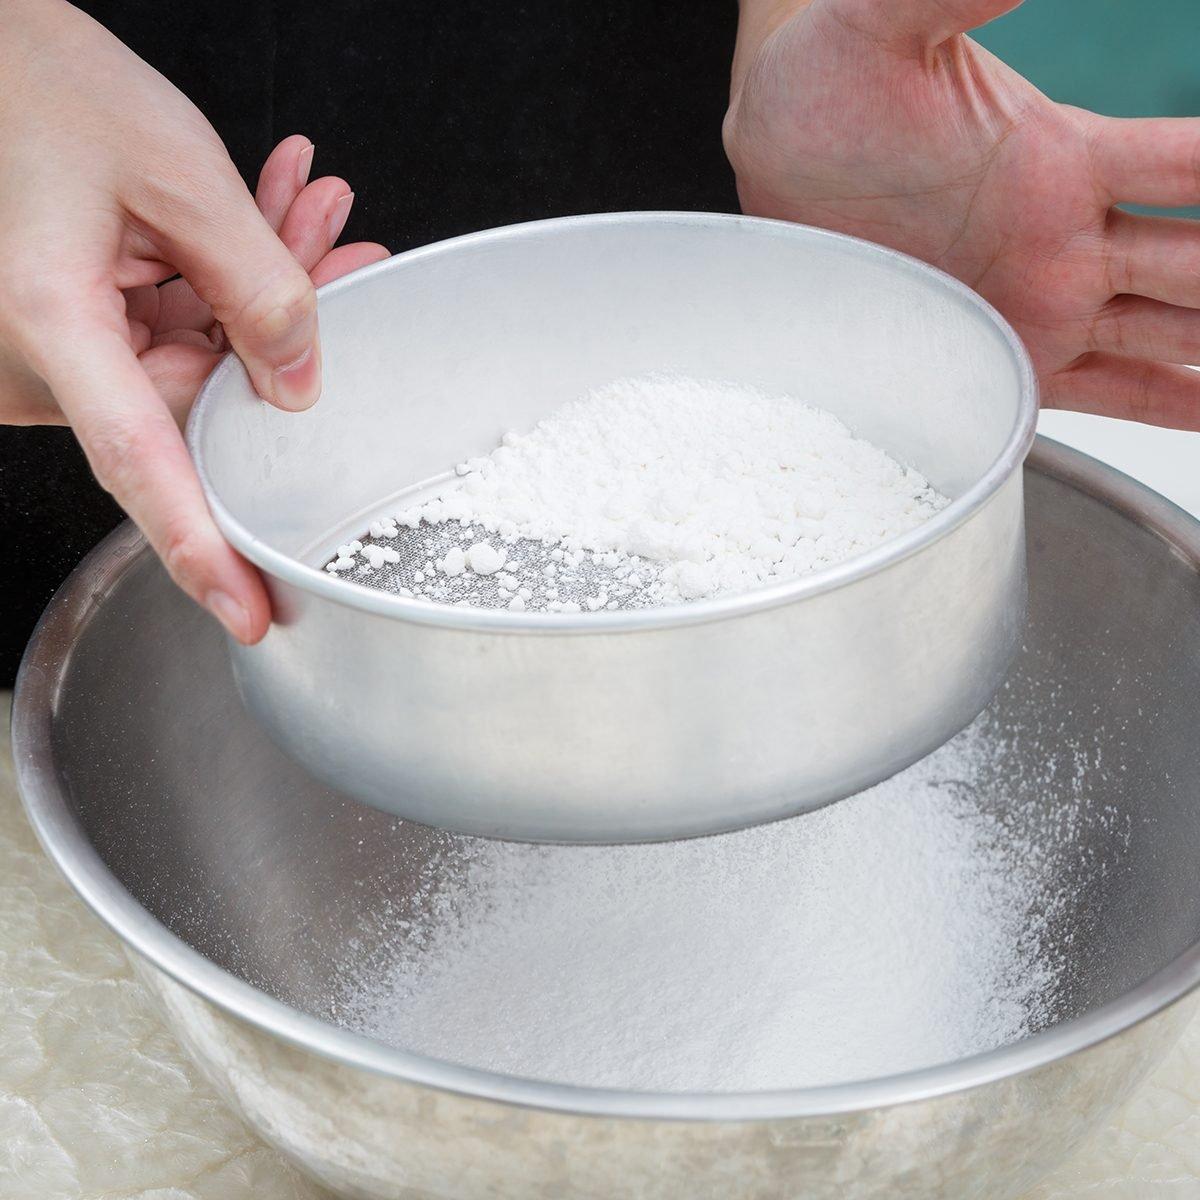 sifting flour with flour filter; Shutterstock ID 214900843; Job (TFH, TOH, RD, BNB, CWM, CM): TOH